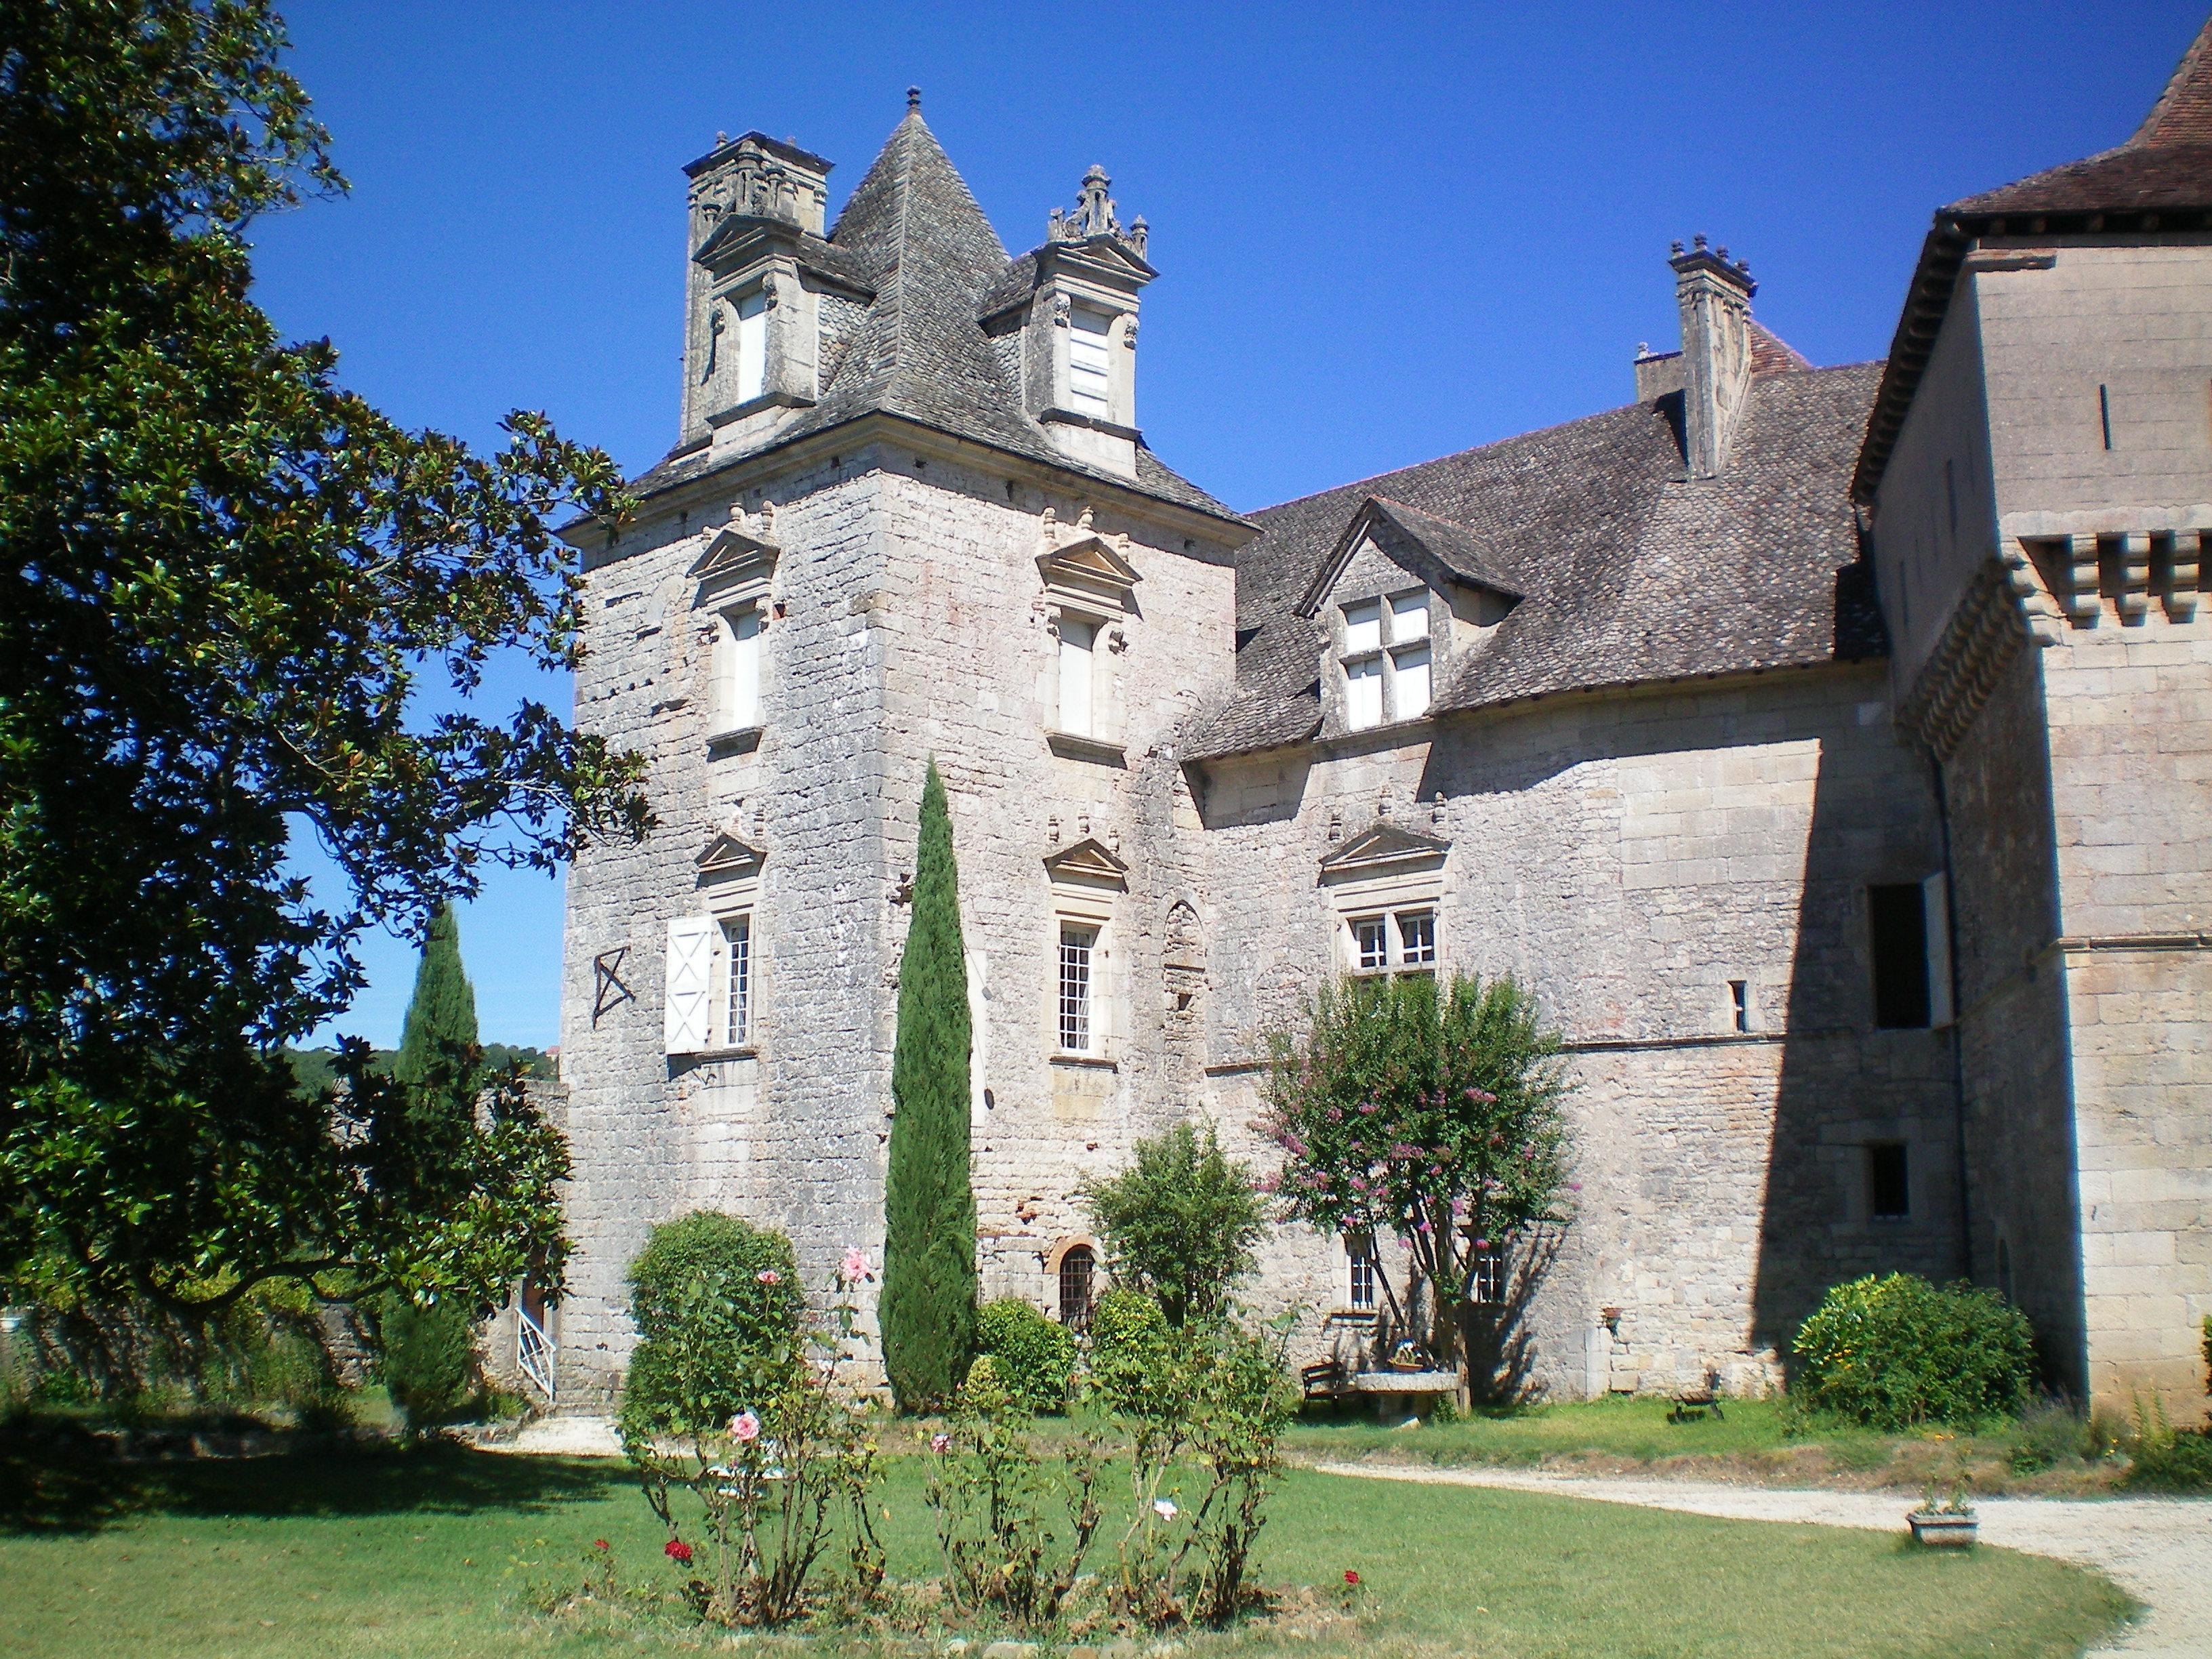 481-chateau_de_cenevieres.jpg